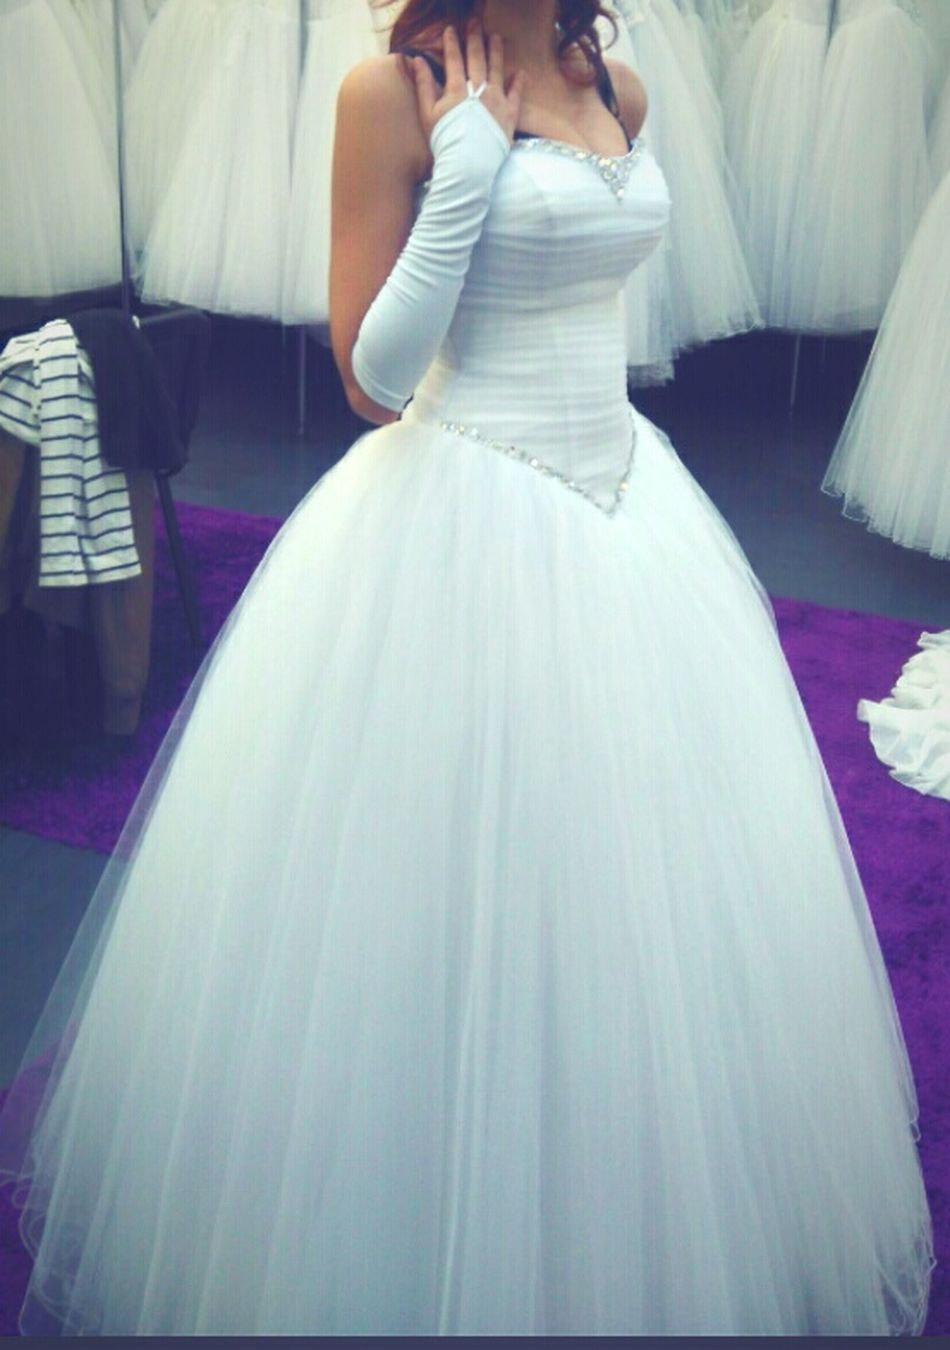 Hello World Nice White White Dress In A White Dress Prom Promdress Promdressshopping Waltz Dress That's Me First Eyeem Photo